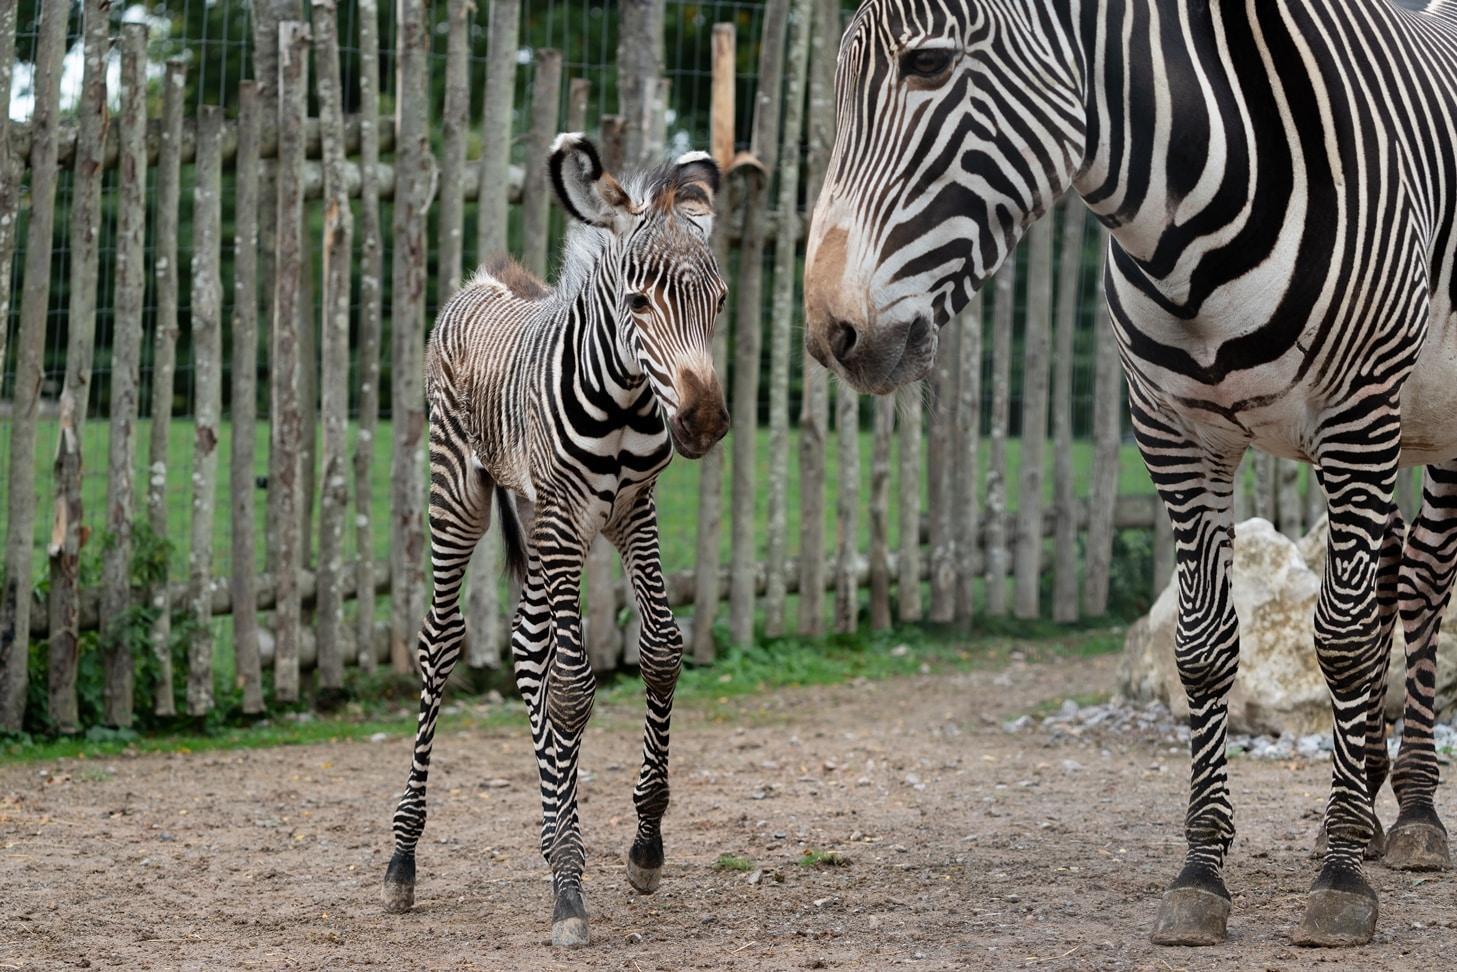 Grevy's zebra - Equus grevyi at Marwell Zoo